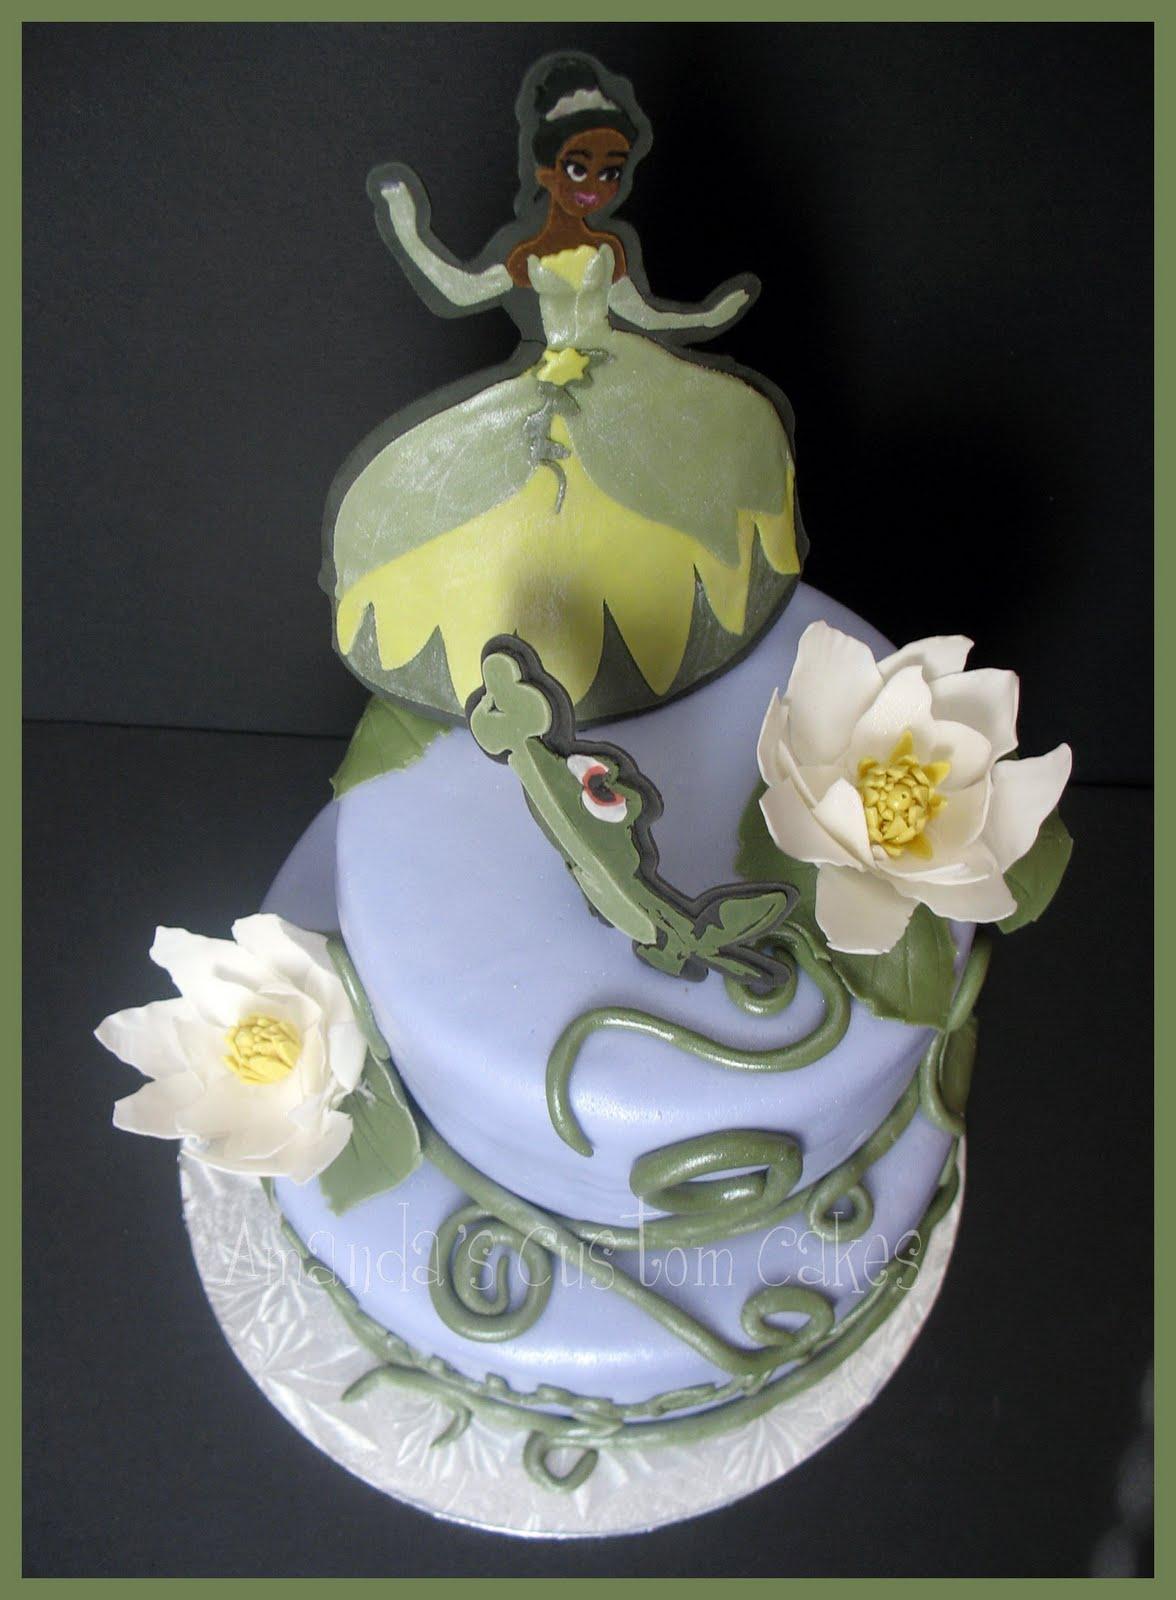 Princess Tiana Cake Images : Amanda s Custom Cakes: Princess Tiana cakes